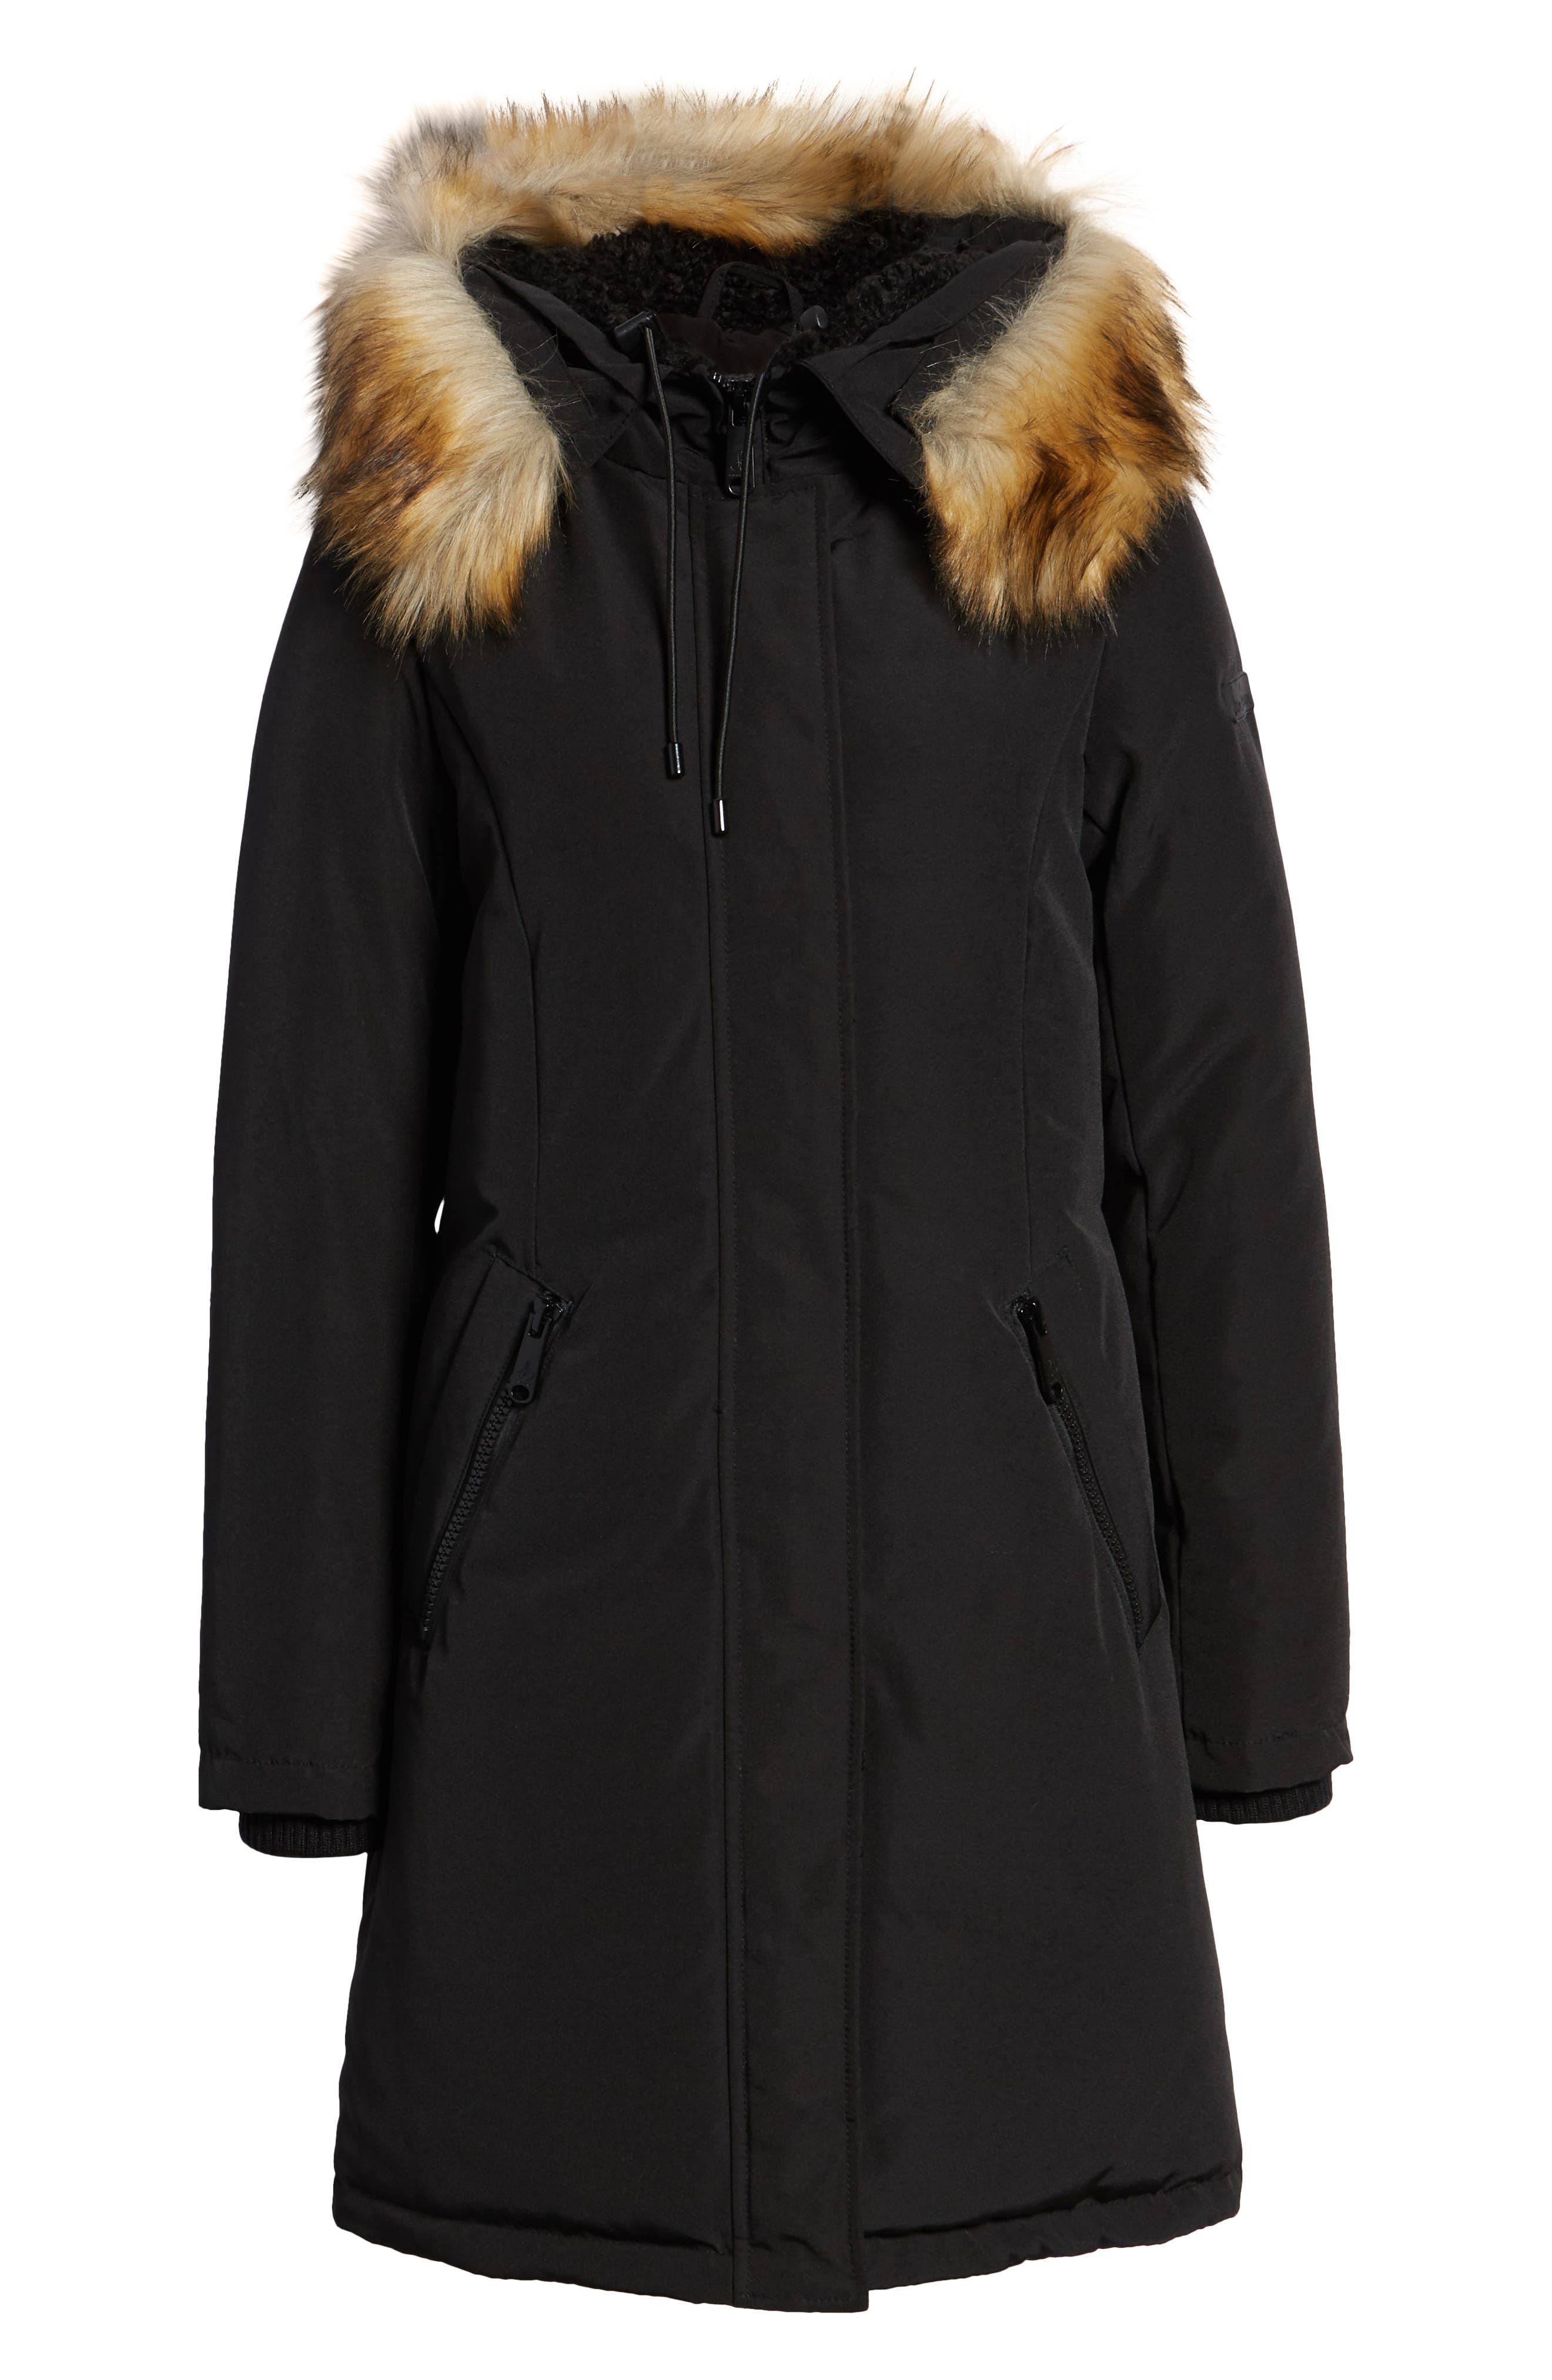 SAM EDELMAN, Faux Fur Trim Down Jacket, Alternate thumbnail 6, color, 001